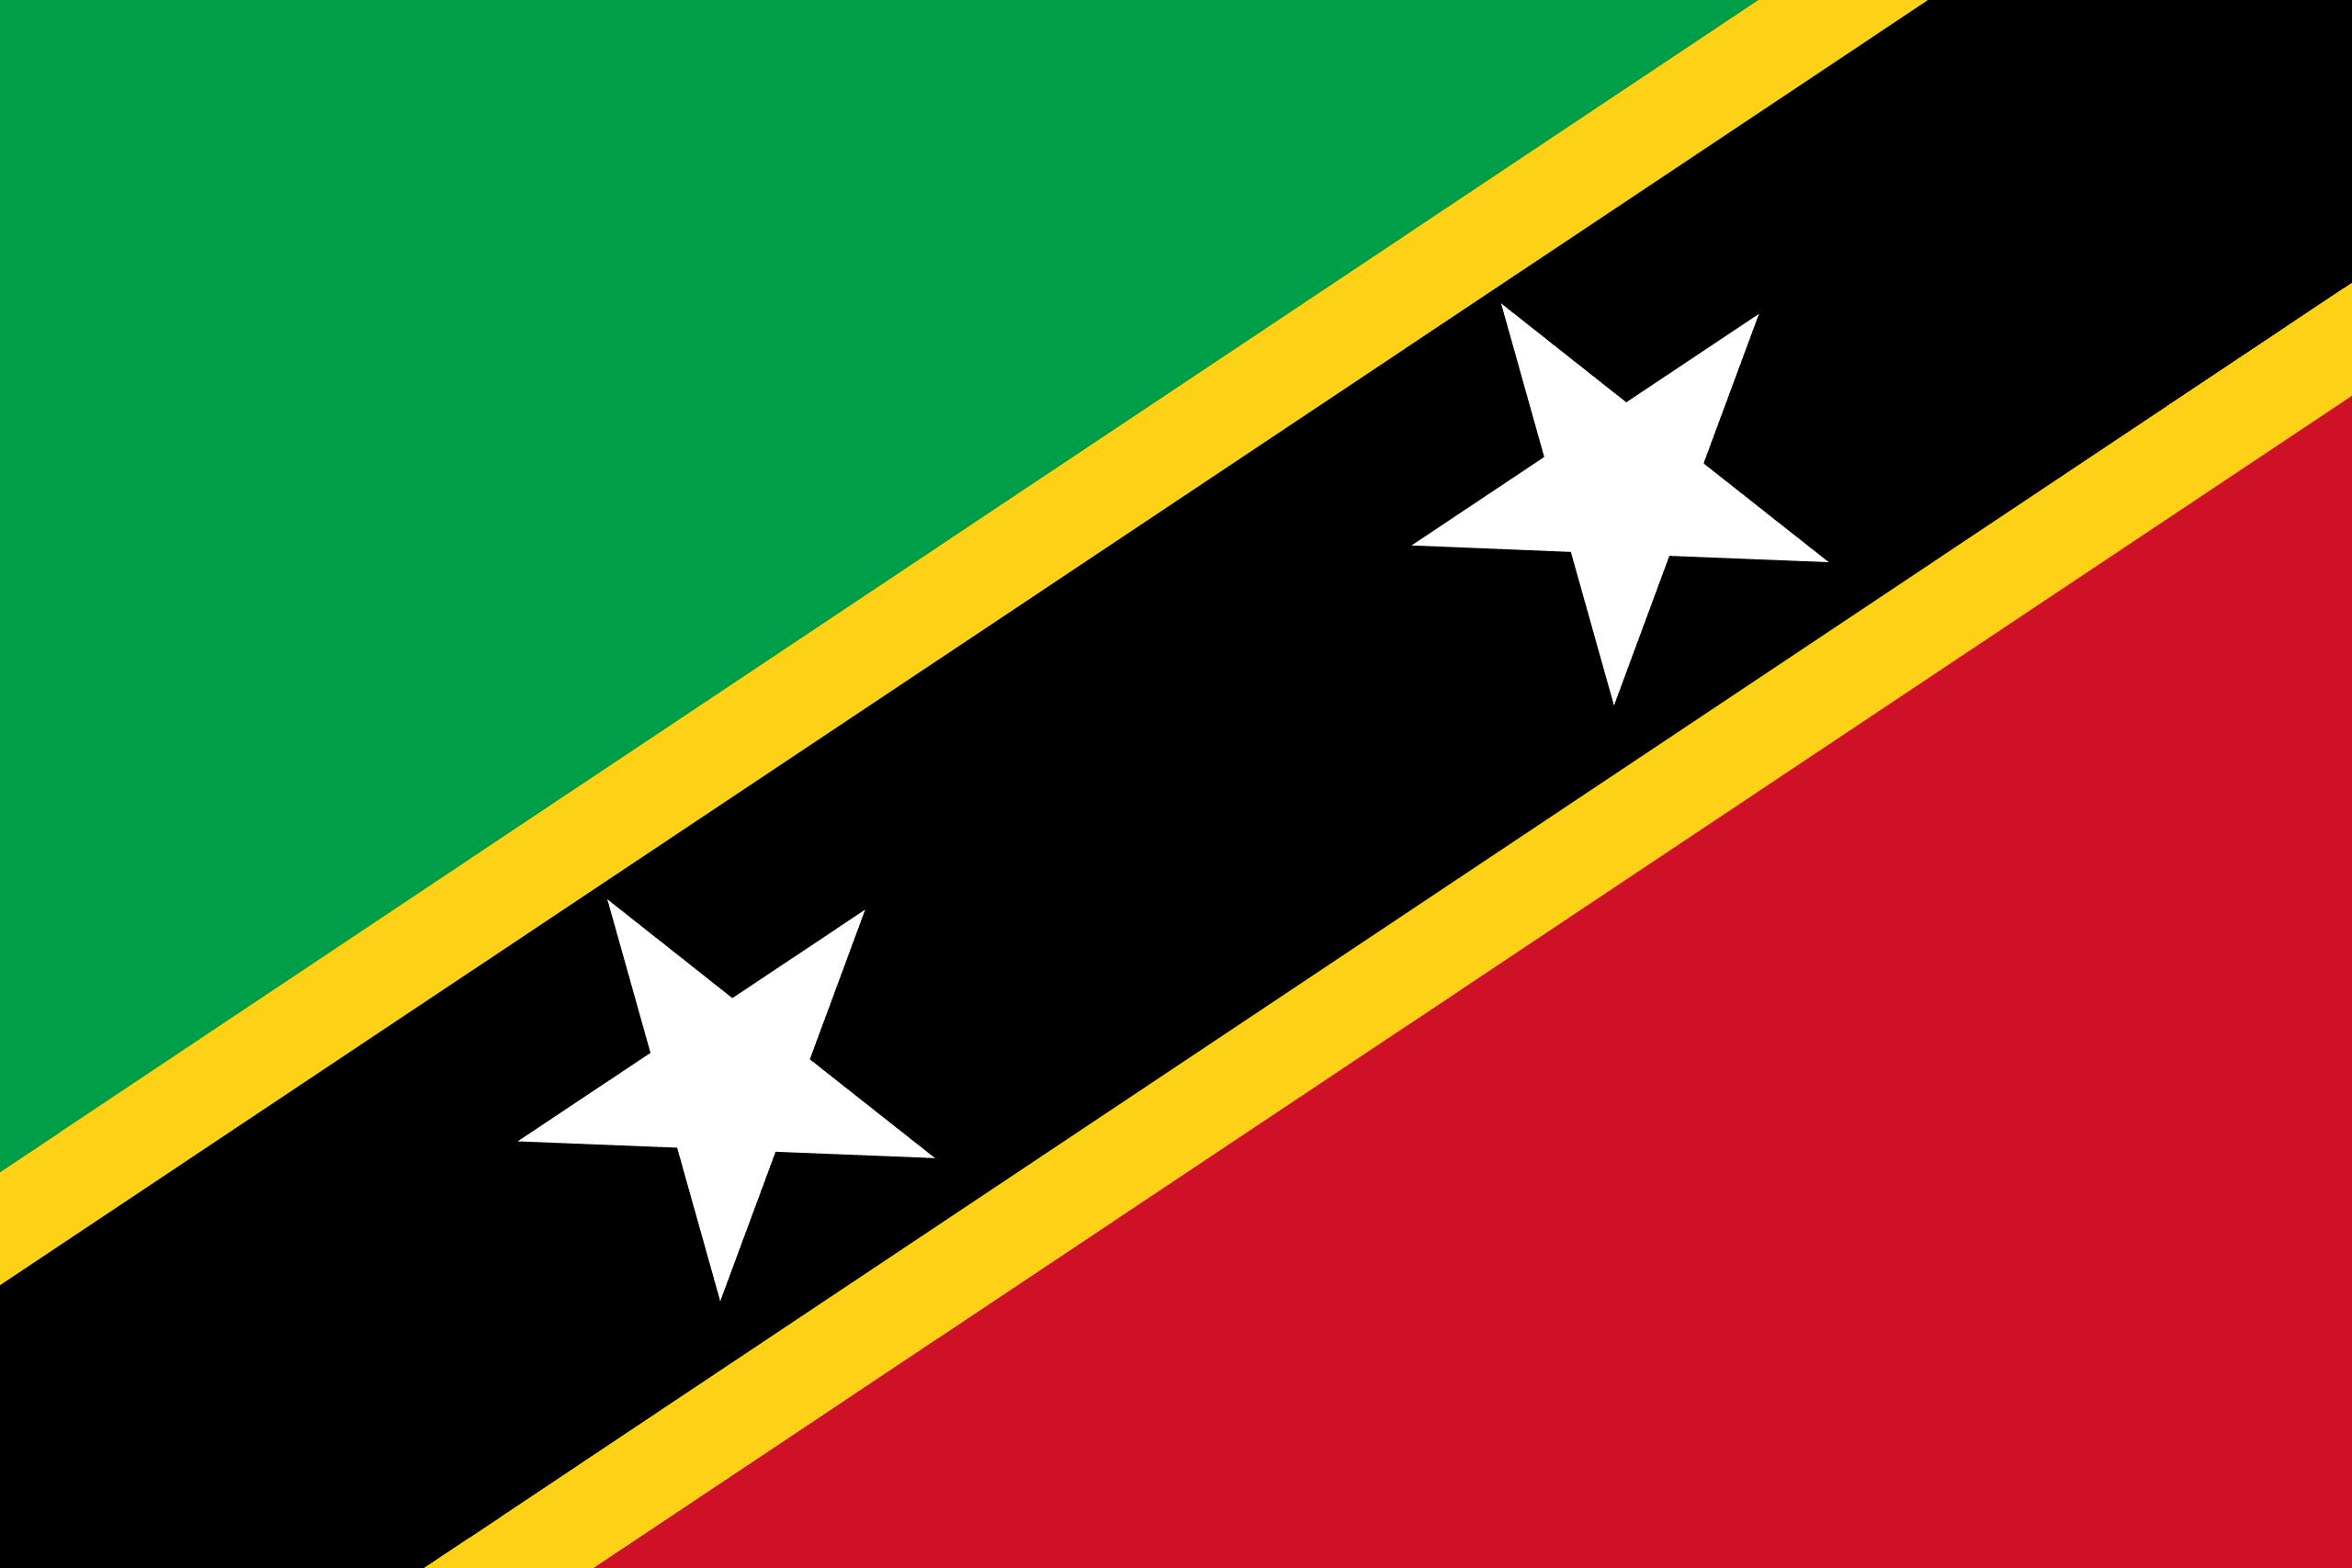 Saint Kitts ve Nevis'in Başkenti ve Para Birimi Nedir? Saint Kitts ve Nevis'in Bayrağı Nasıldır?